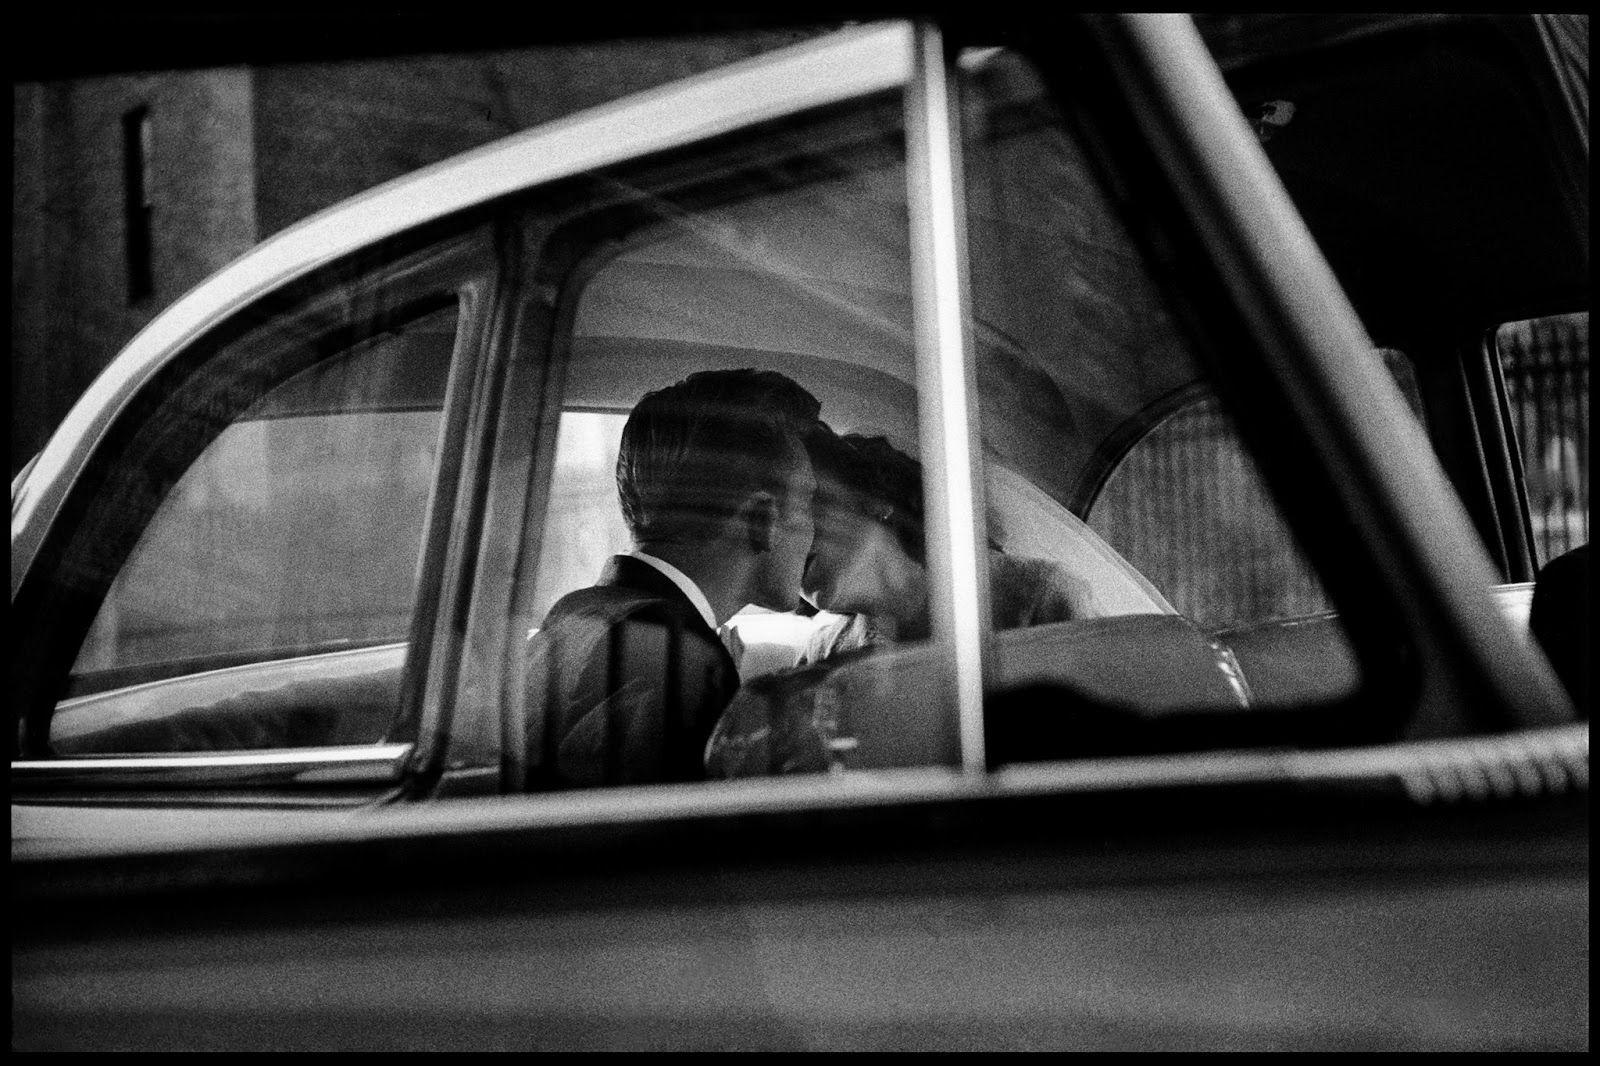 New York City, USA. 1955. Photo by Elliott Erwitt